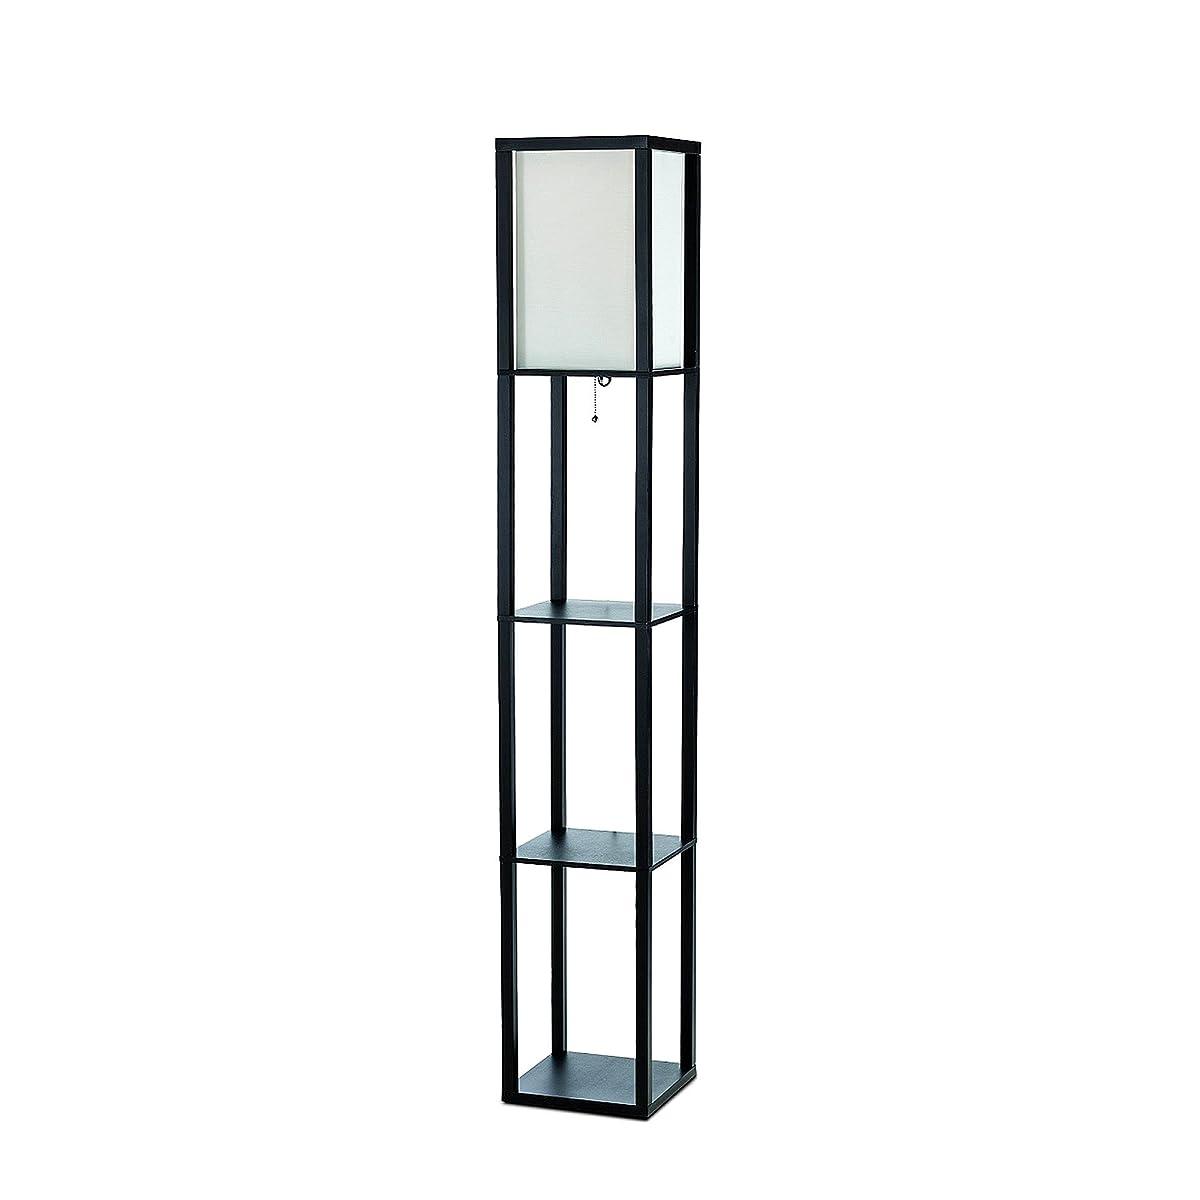 Simple Designs LF1014-BLK Floor Lamp Etagere Organizer Storage Shelf with Linen Shade, Black